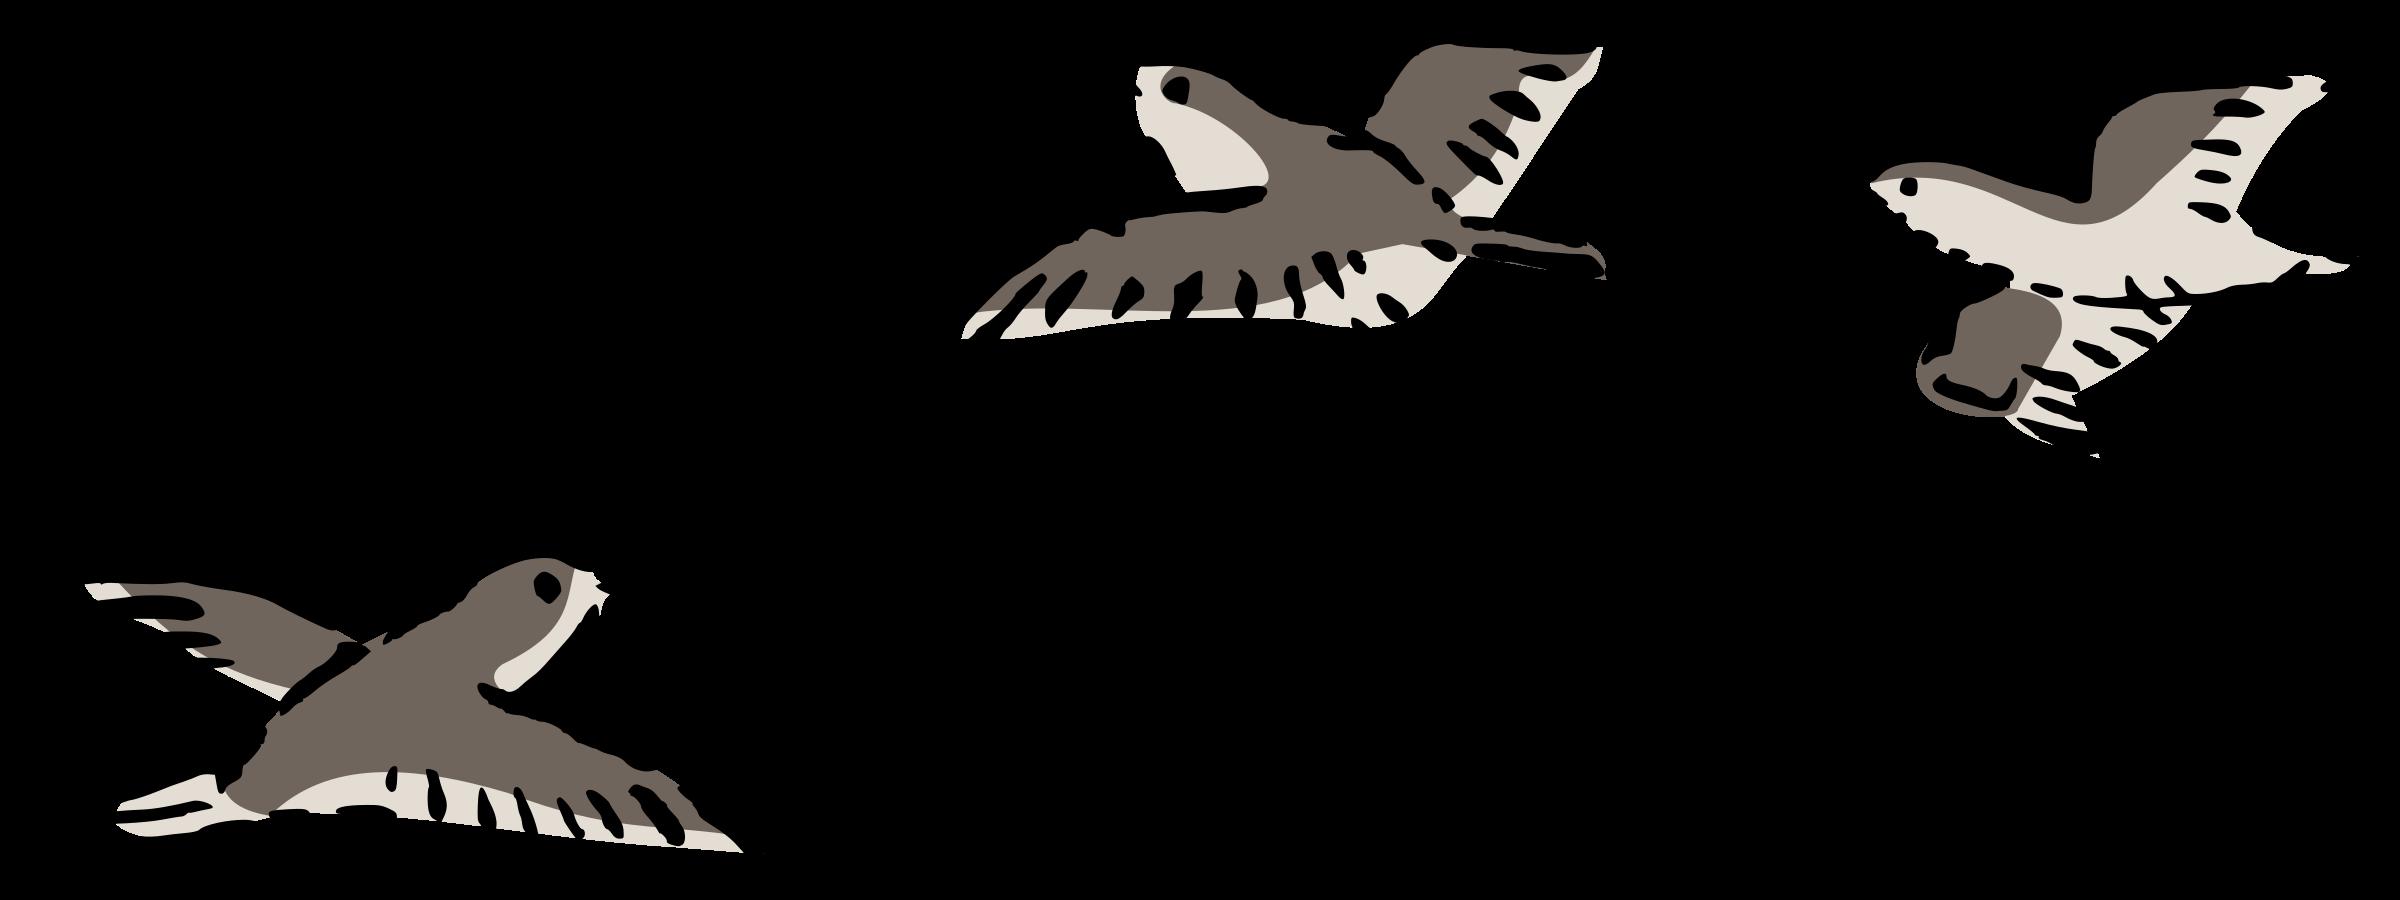 jpg freeuse download Bird flight Columbidae Domestic pigeon Clip art